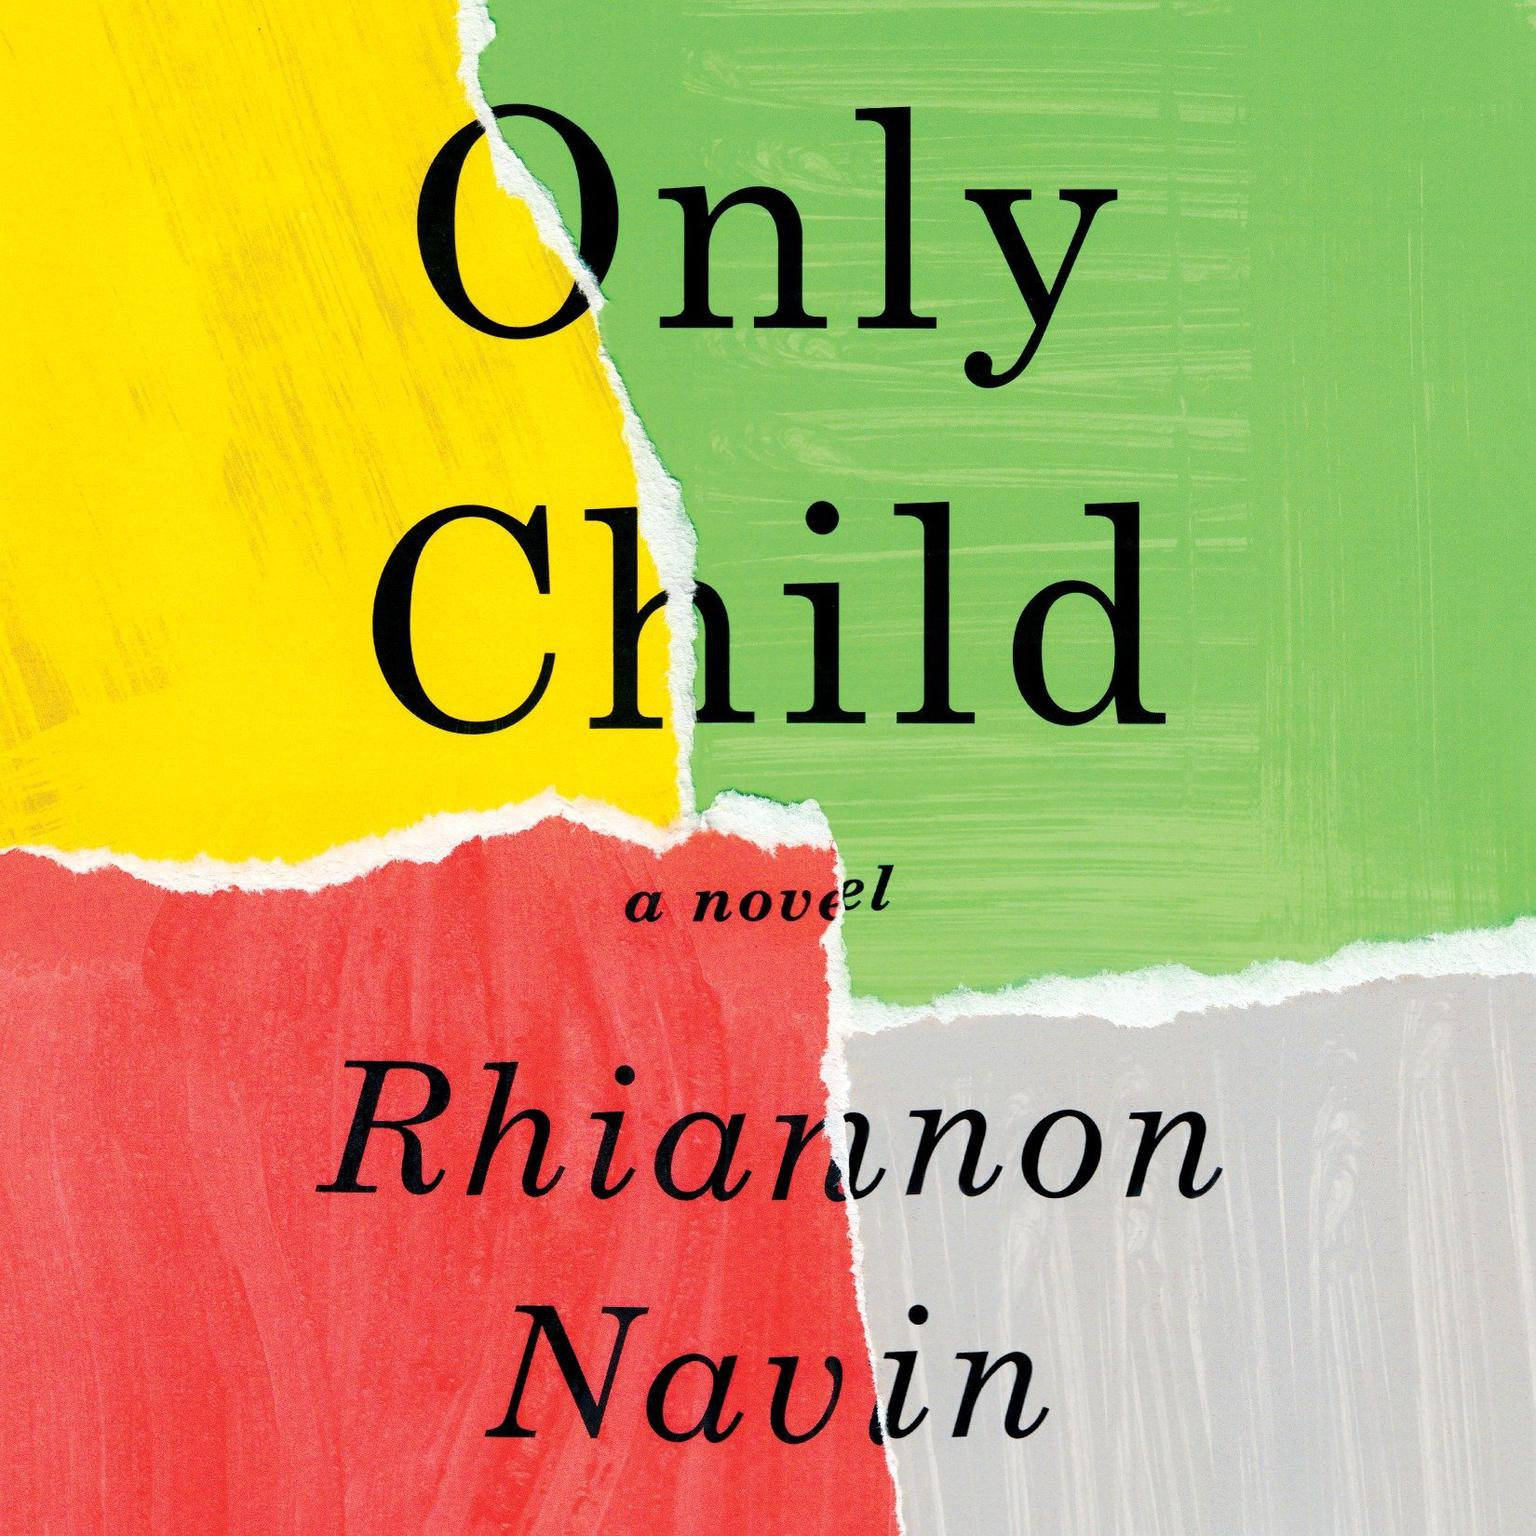 Only Child: A novel Audiobook, by Rhiannon Navin